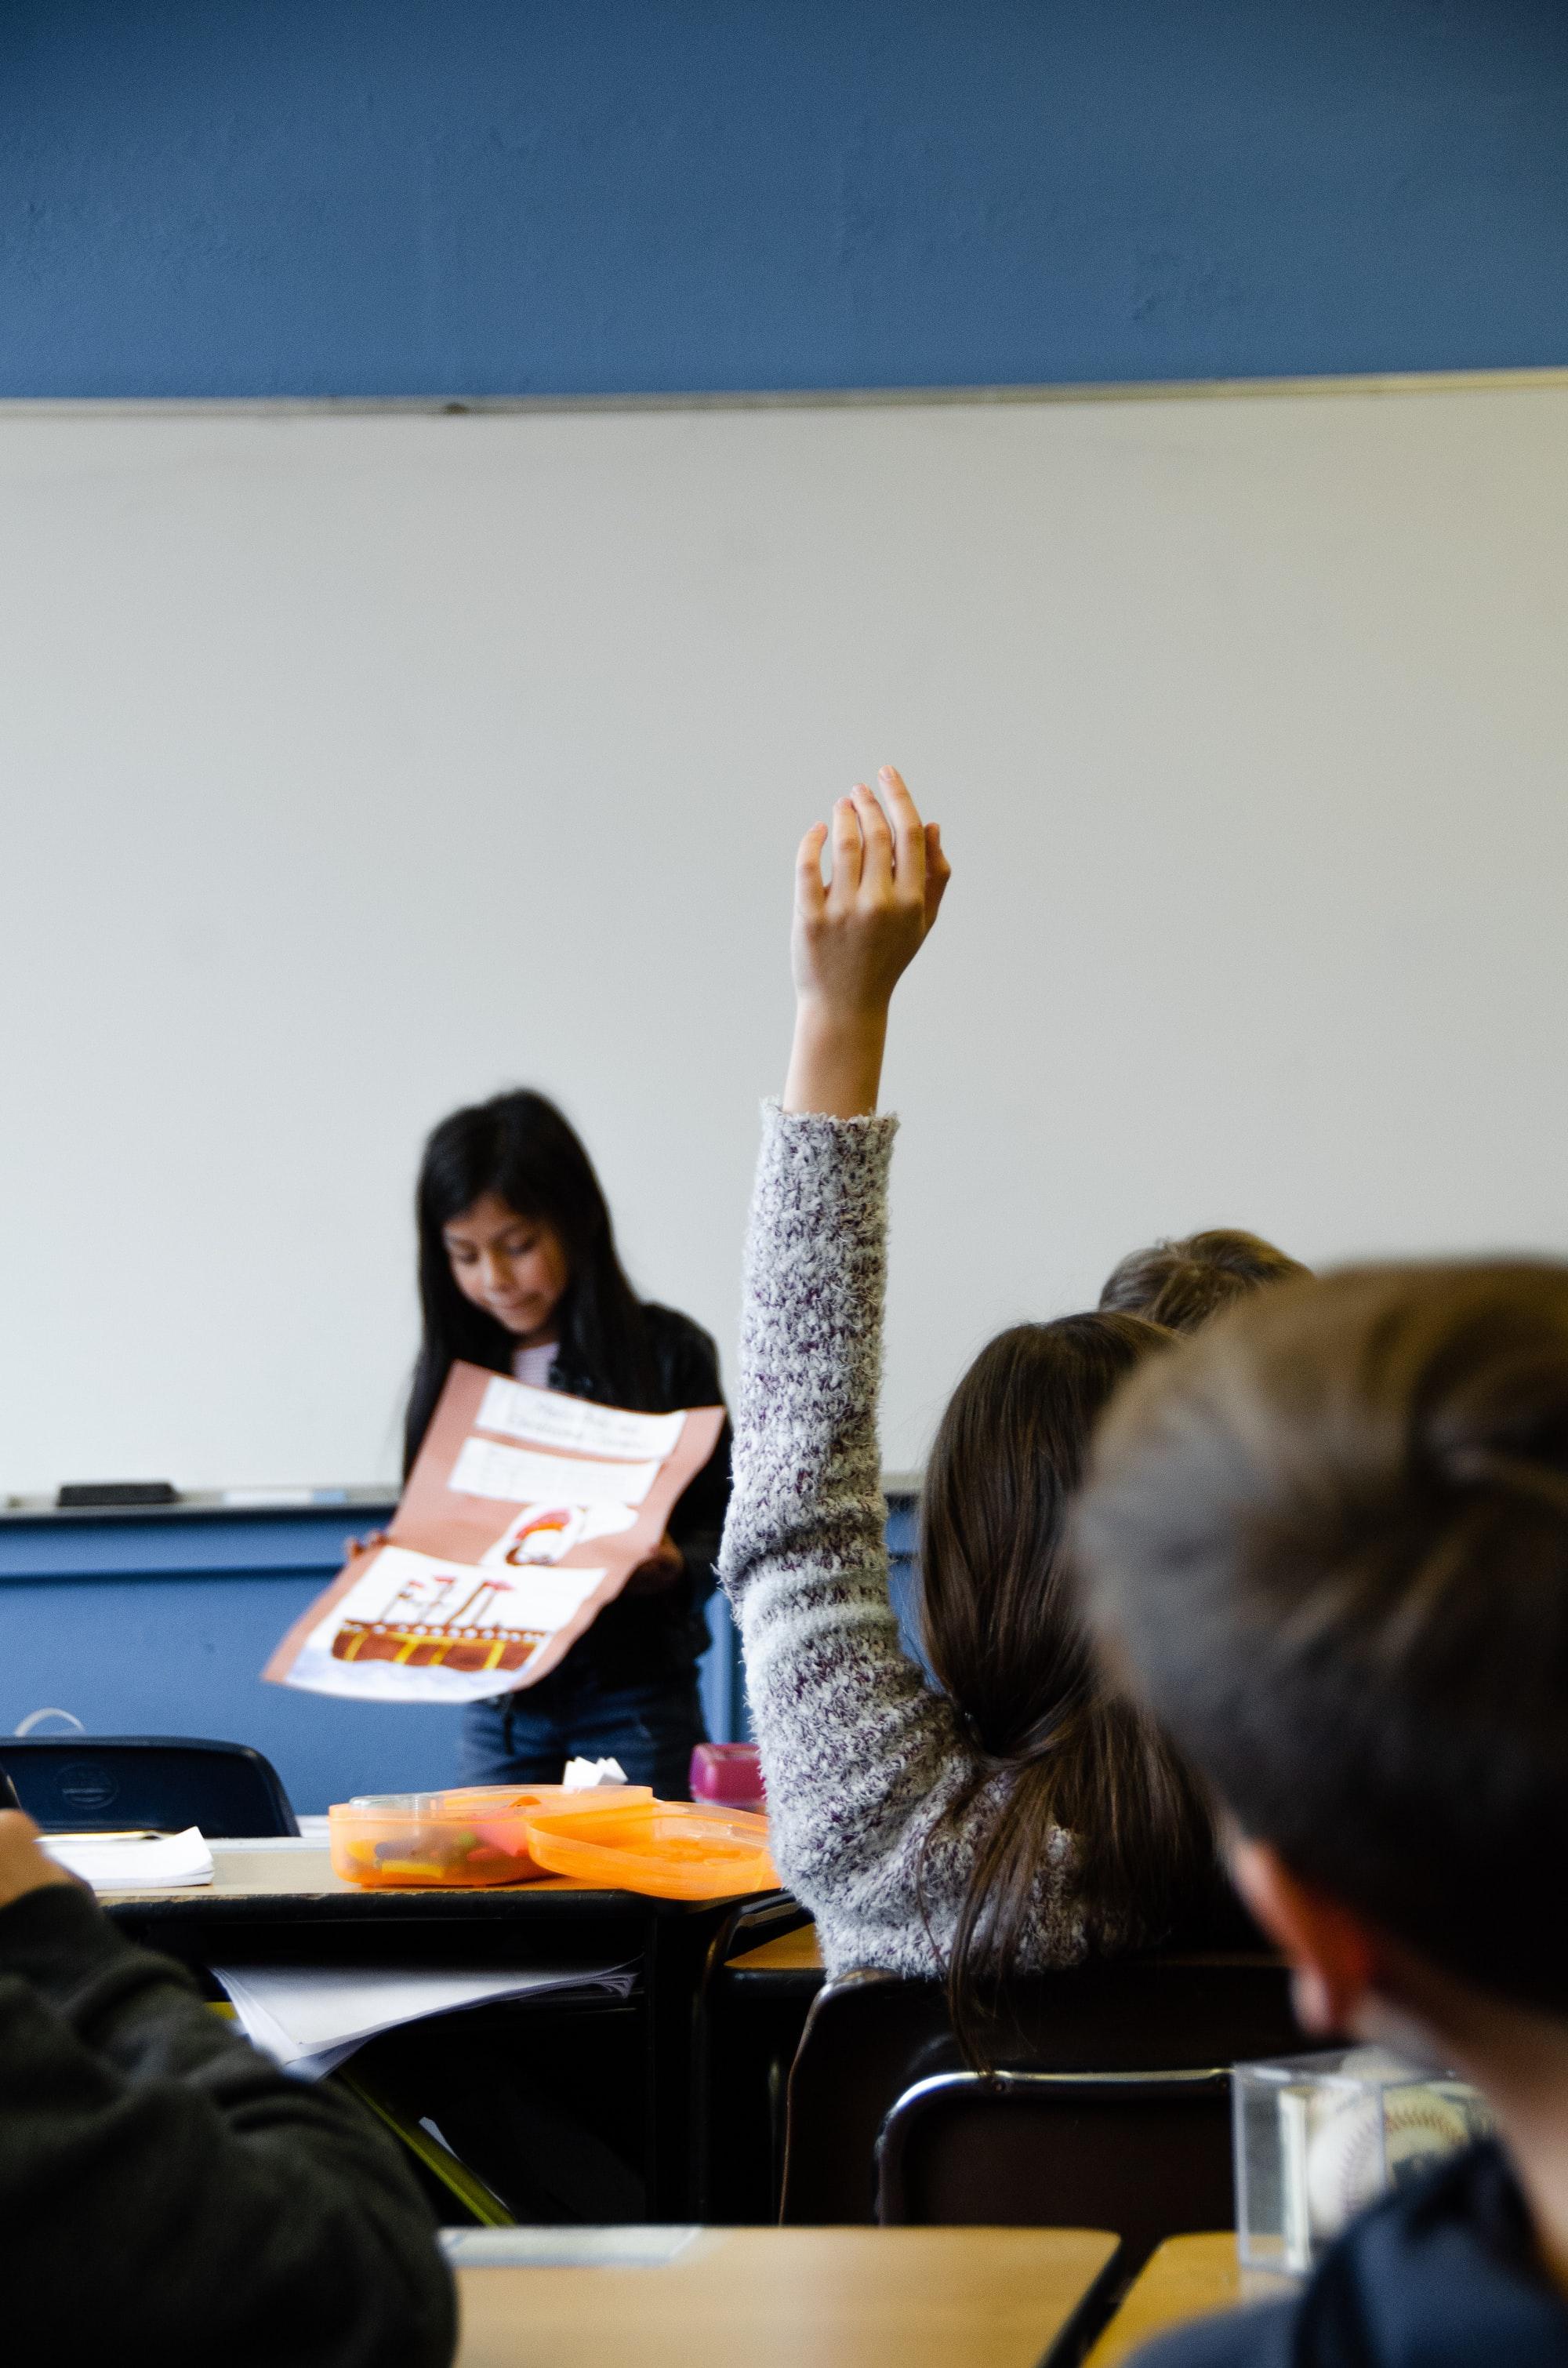 Teaching 21st-century communication skills that works